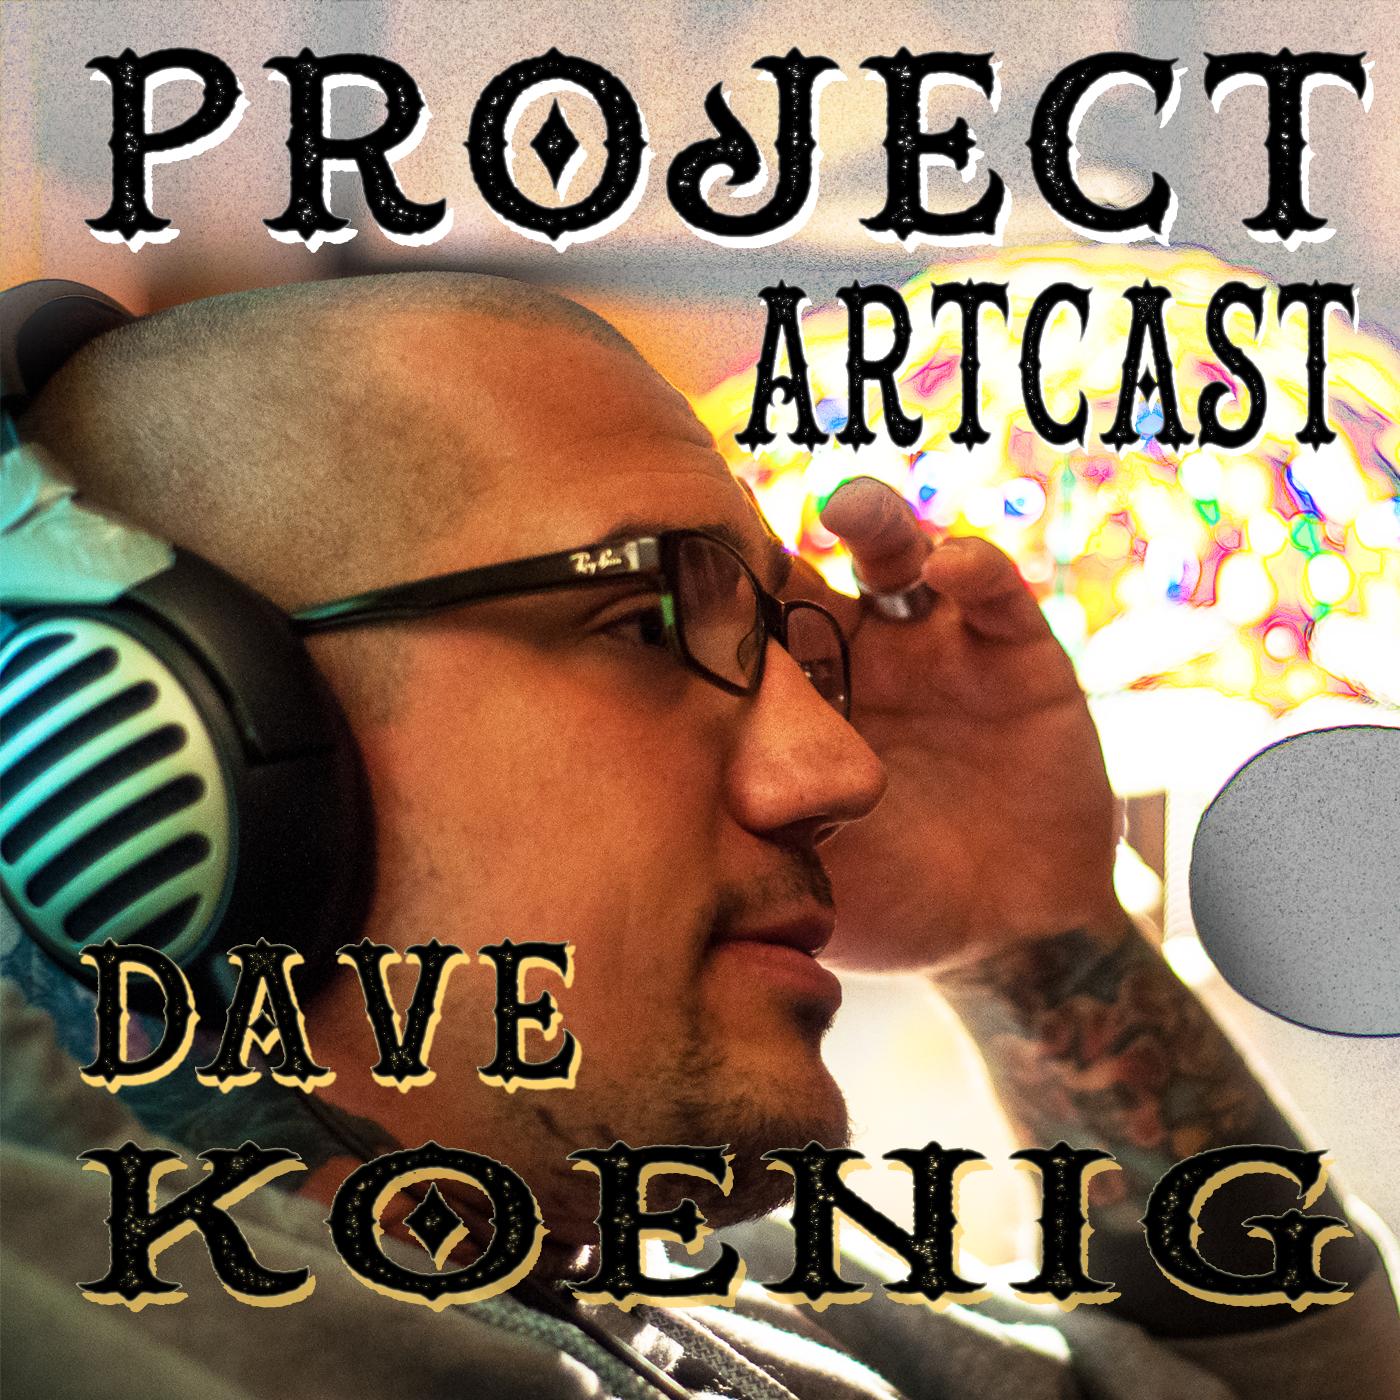 Project Artcast